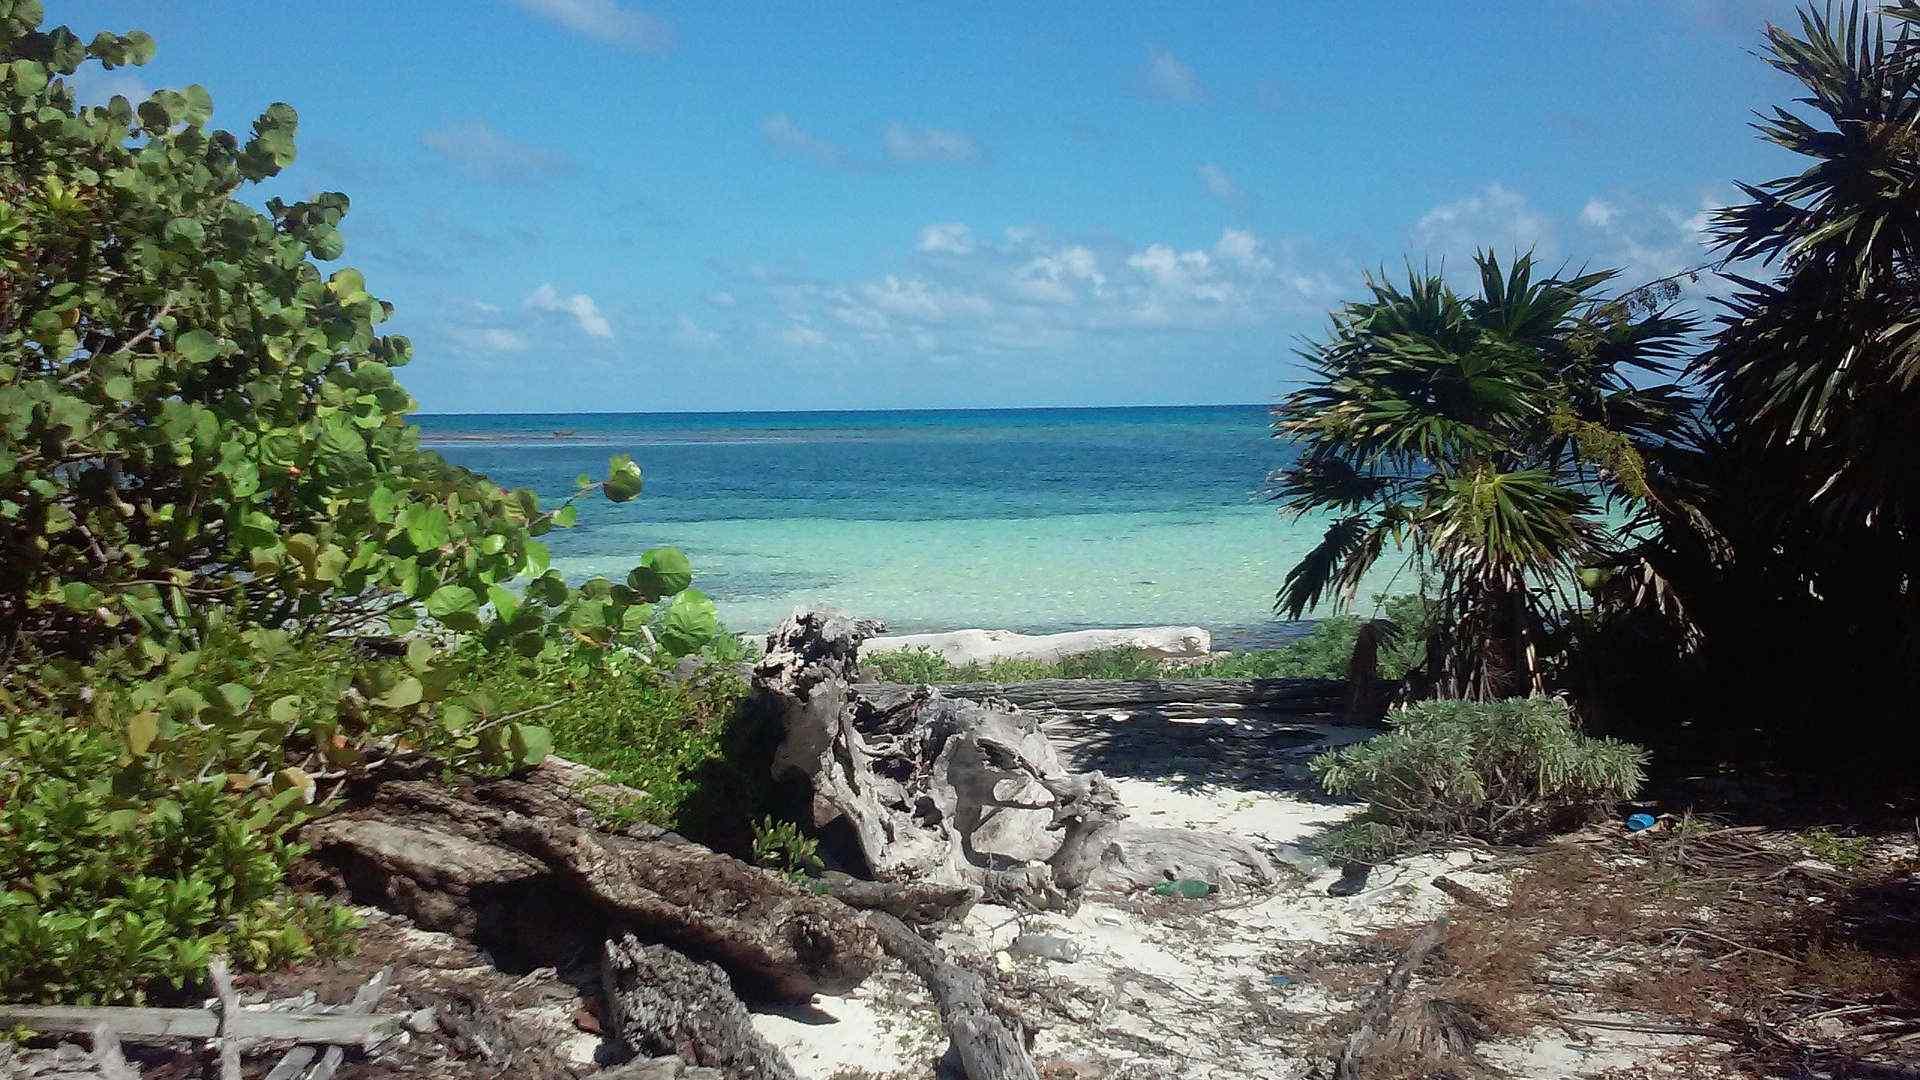 Custom-Travel-Planner-Network-Belize-beach